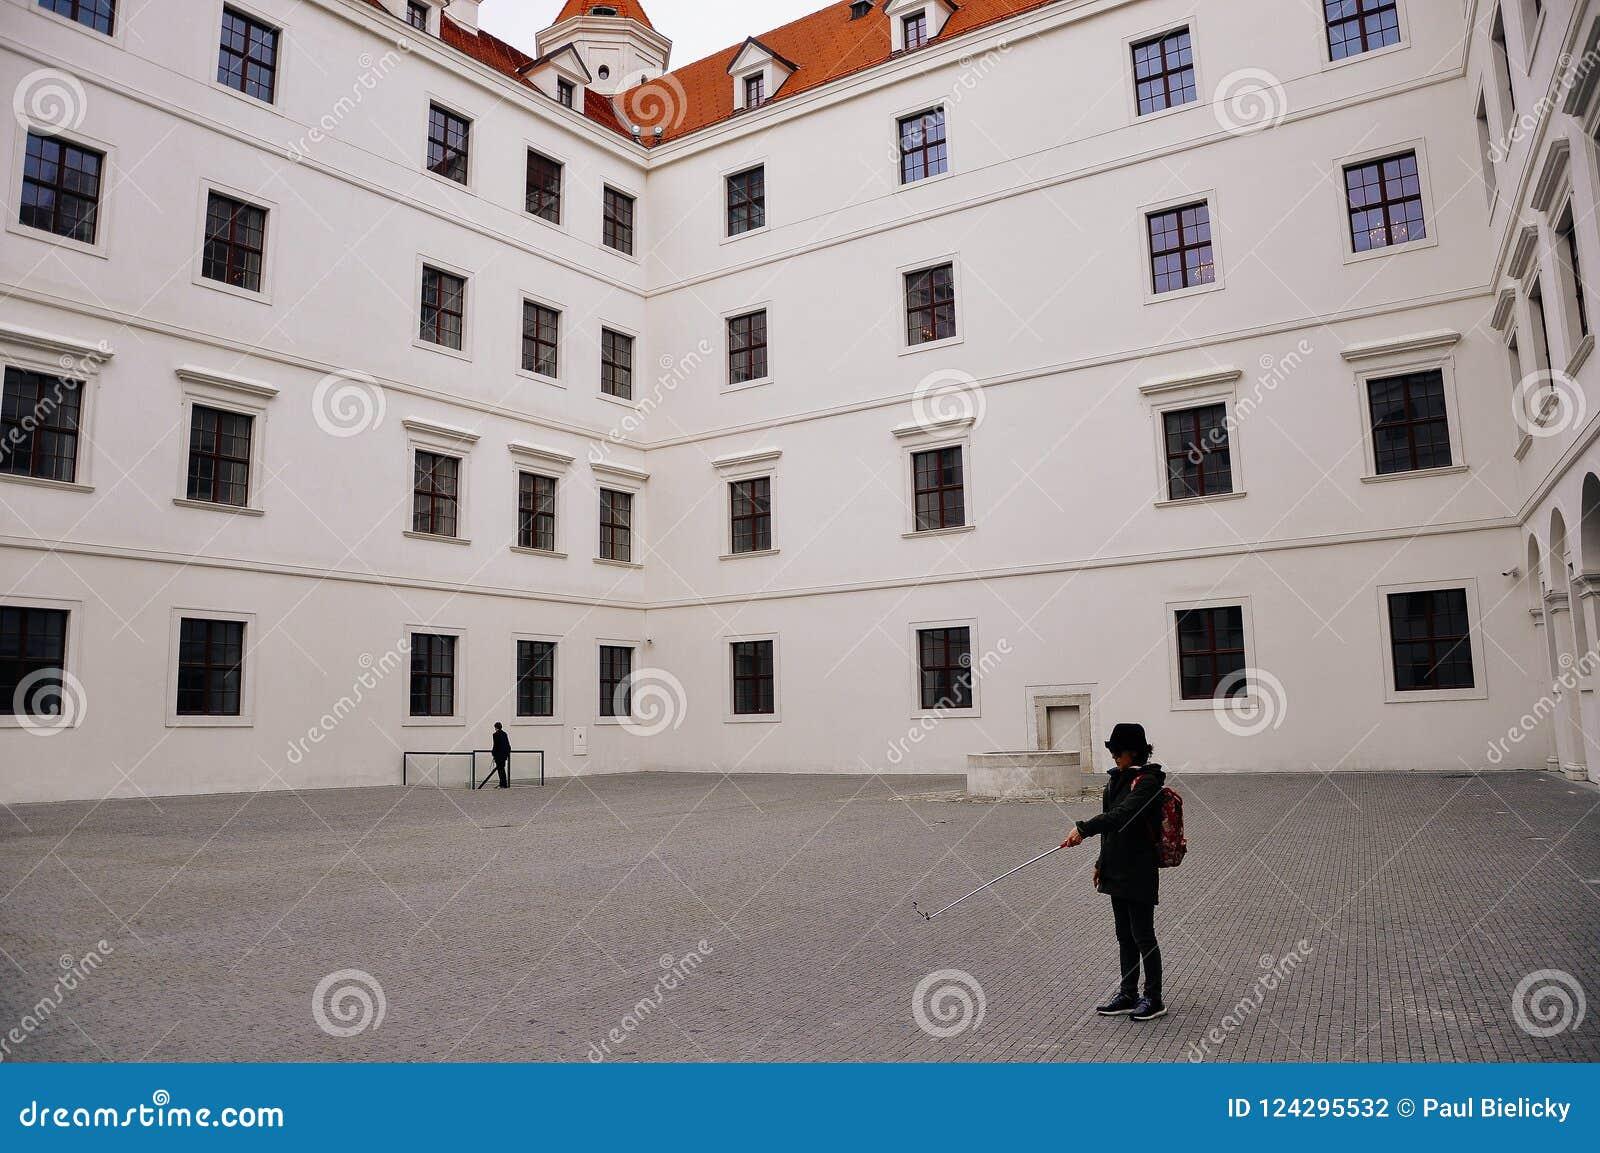 A inside view of Bratislava Castle, Bratislava, Slovakia.